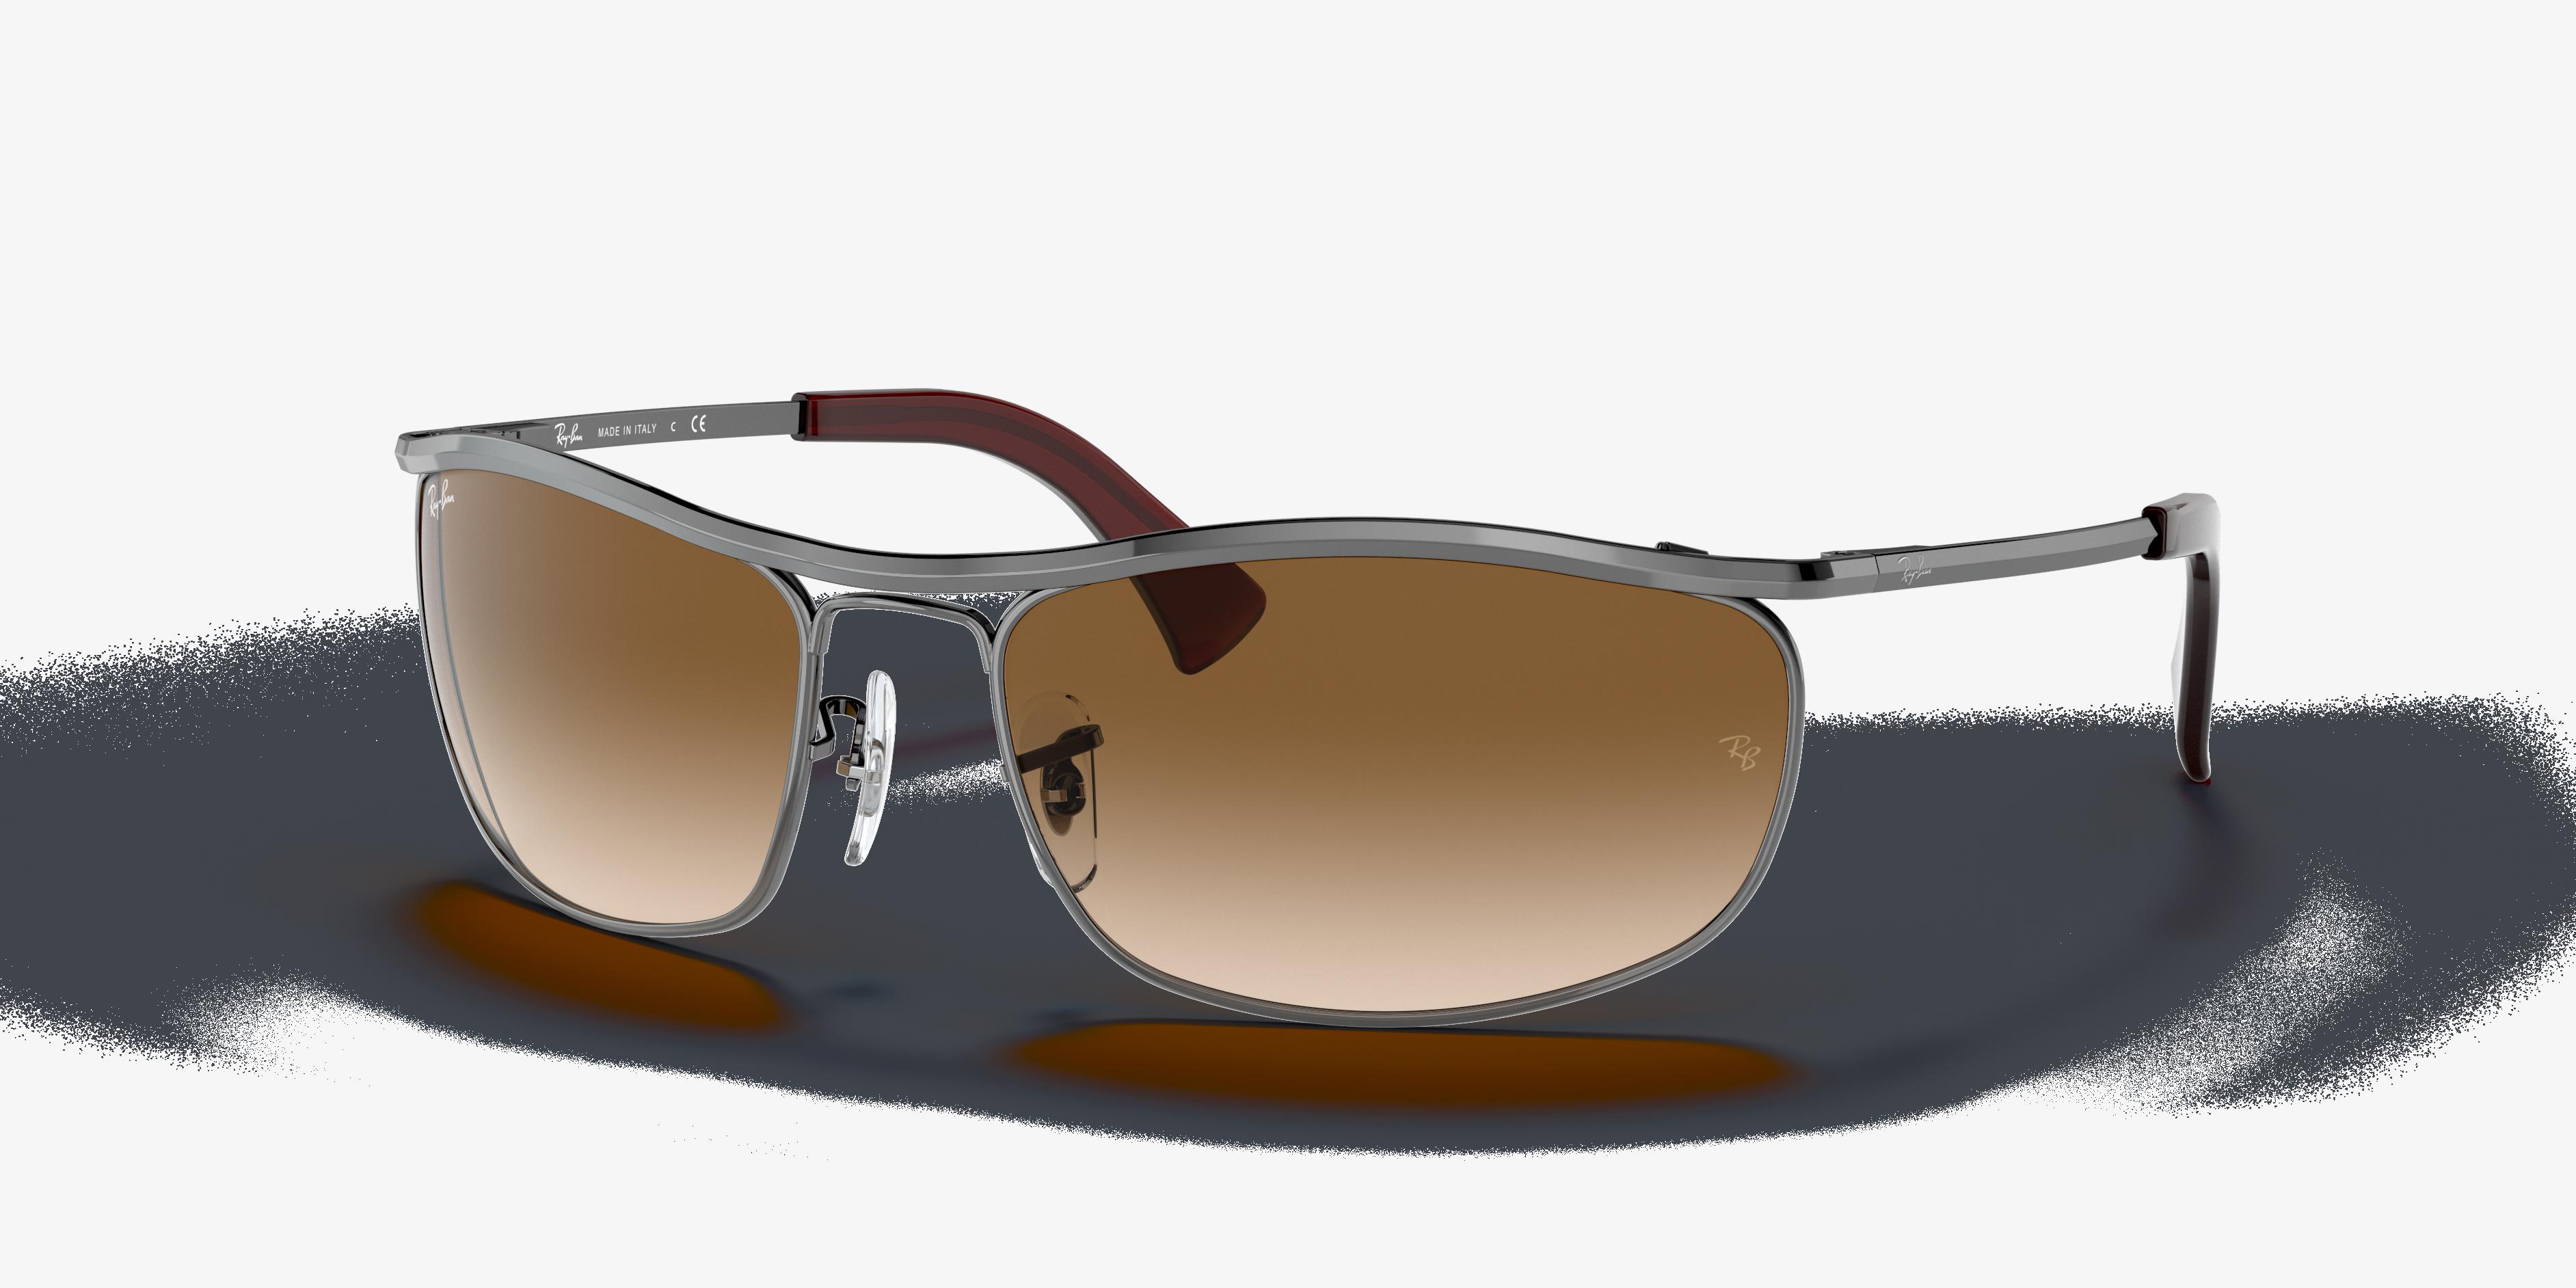 Ray-Ban Olympian Gunmetal, Brown Lenses - RB3119